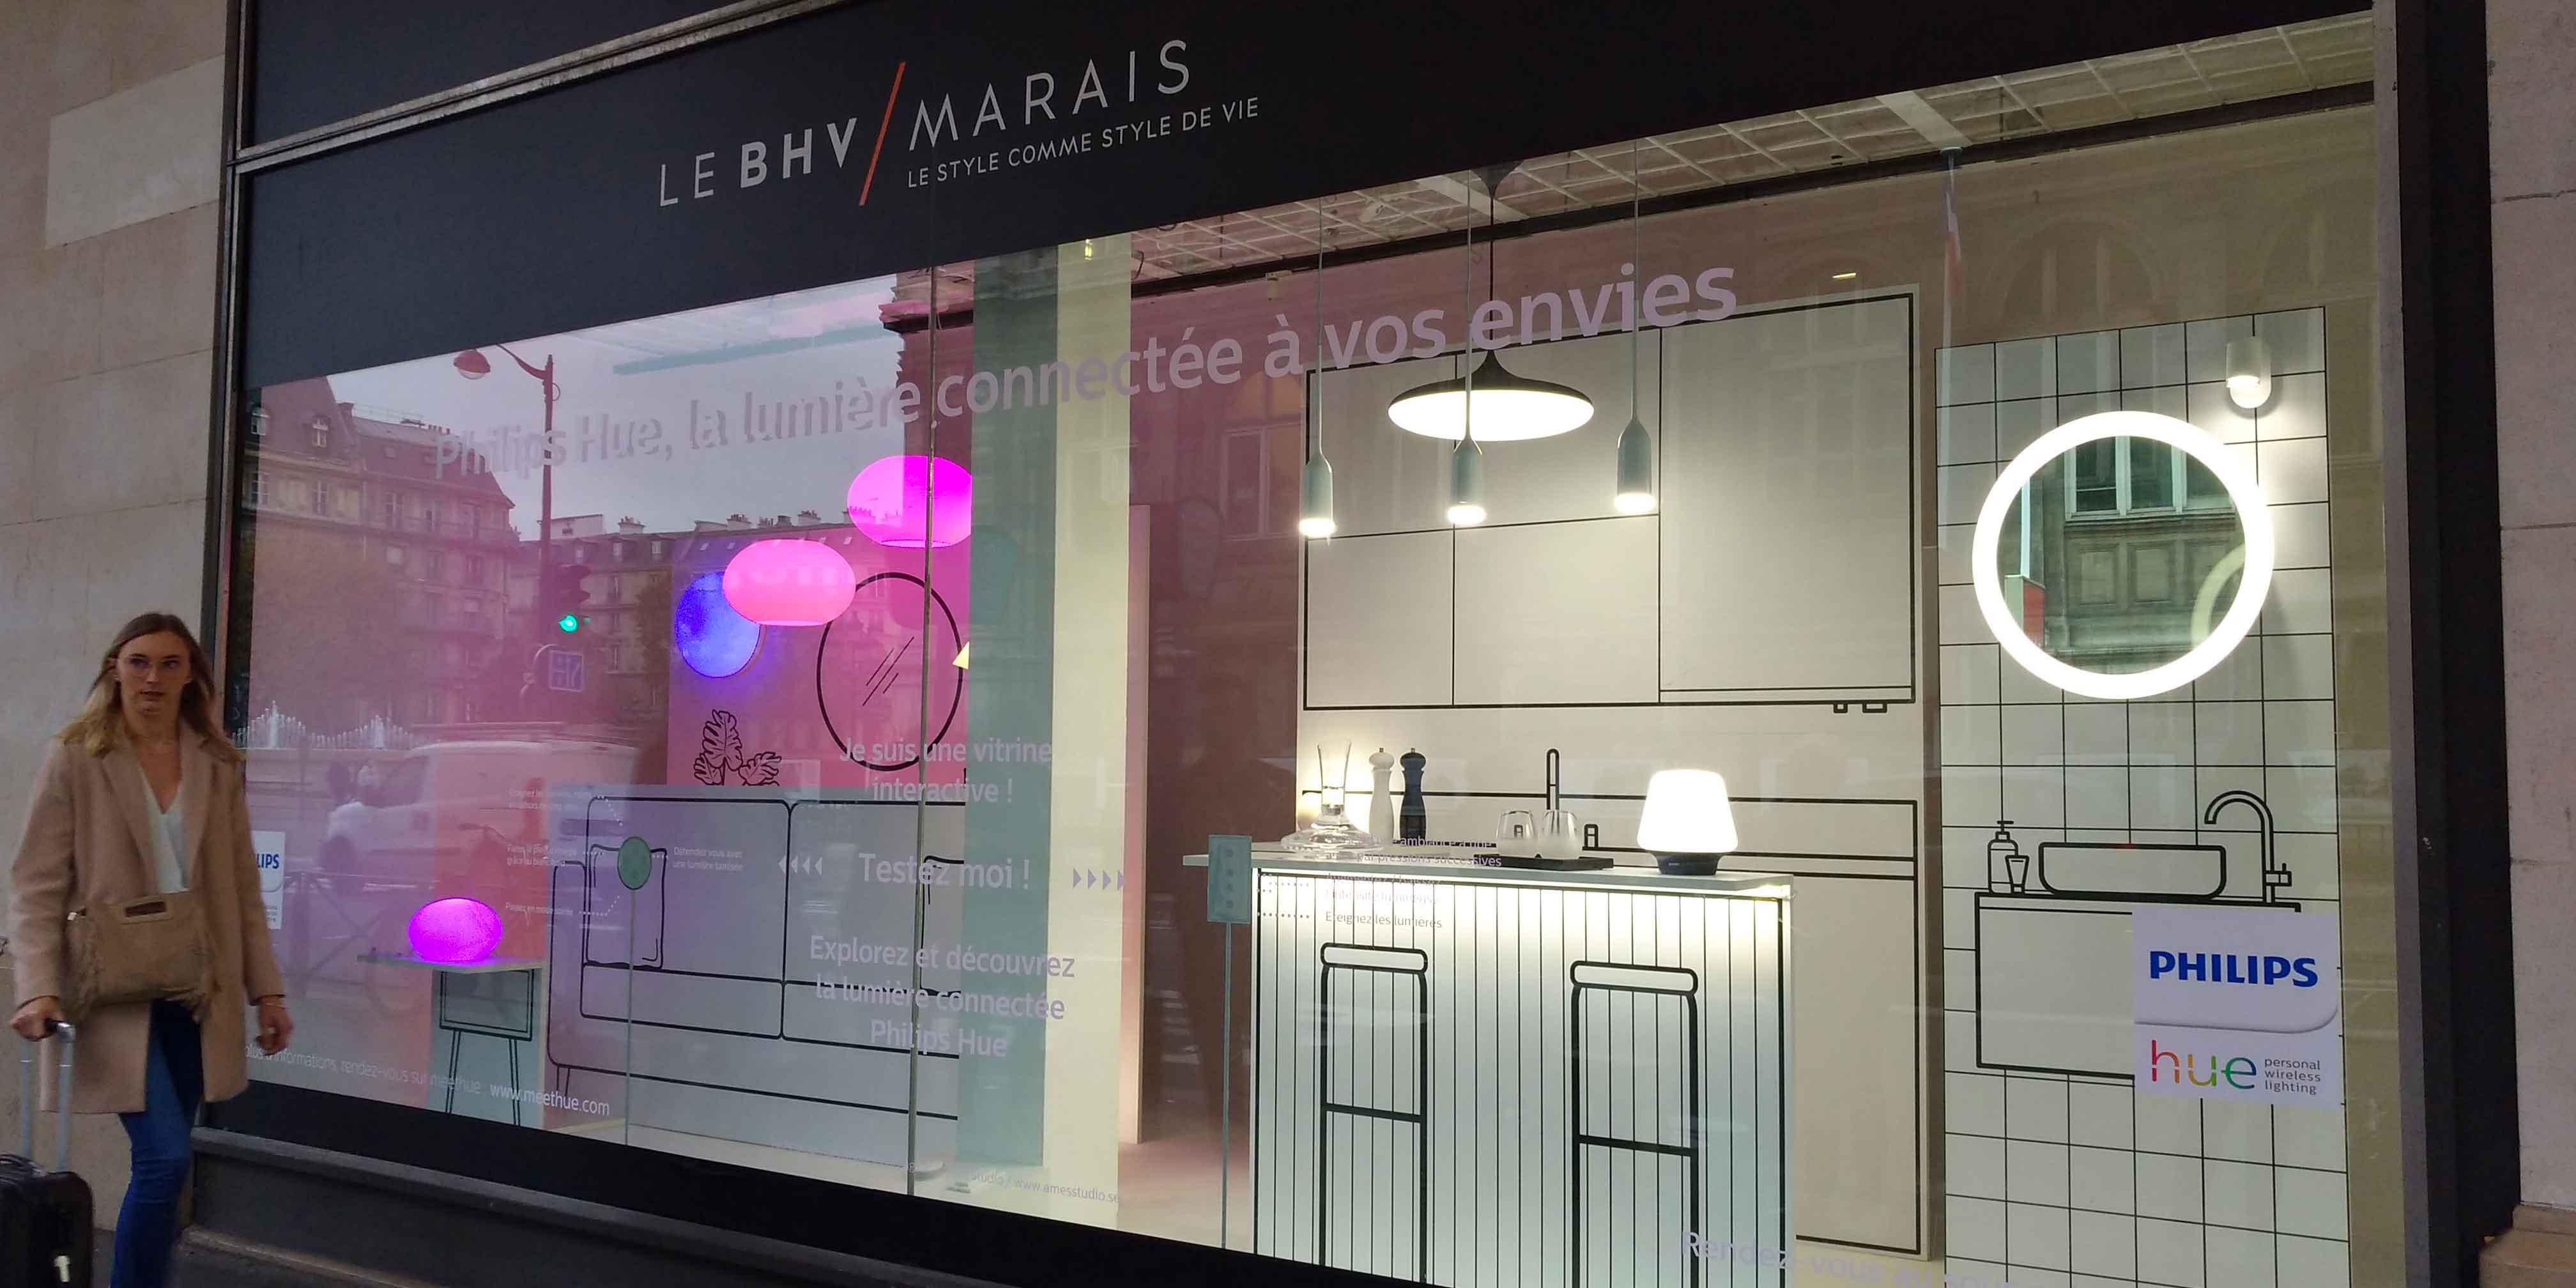 Vitrine interactive : Philips Hue illumine le BHV Marais